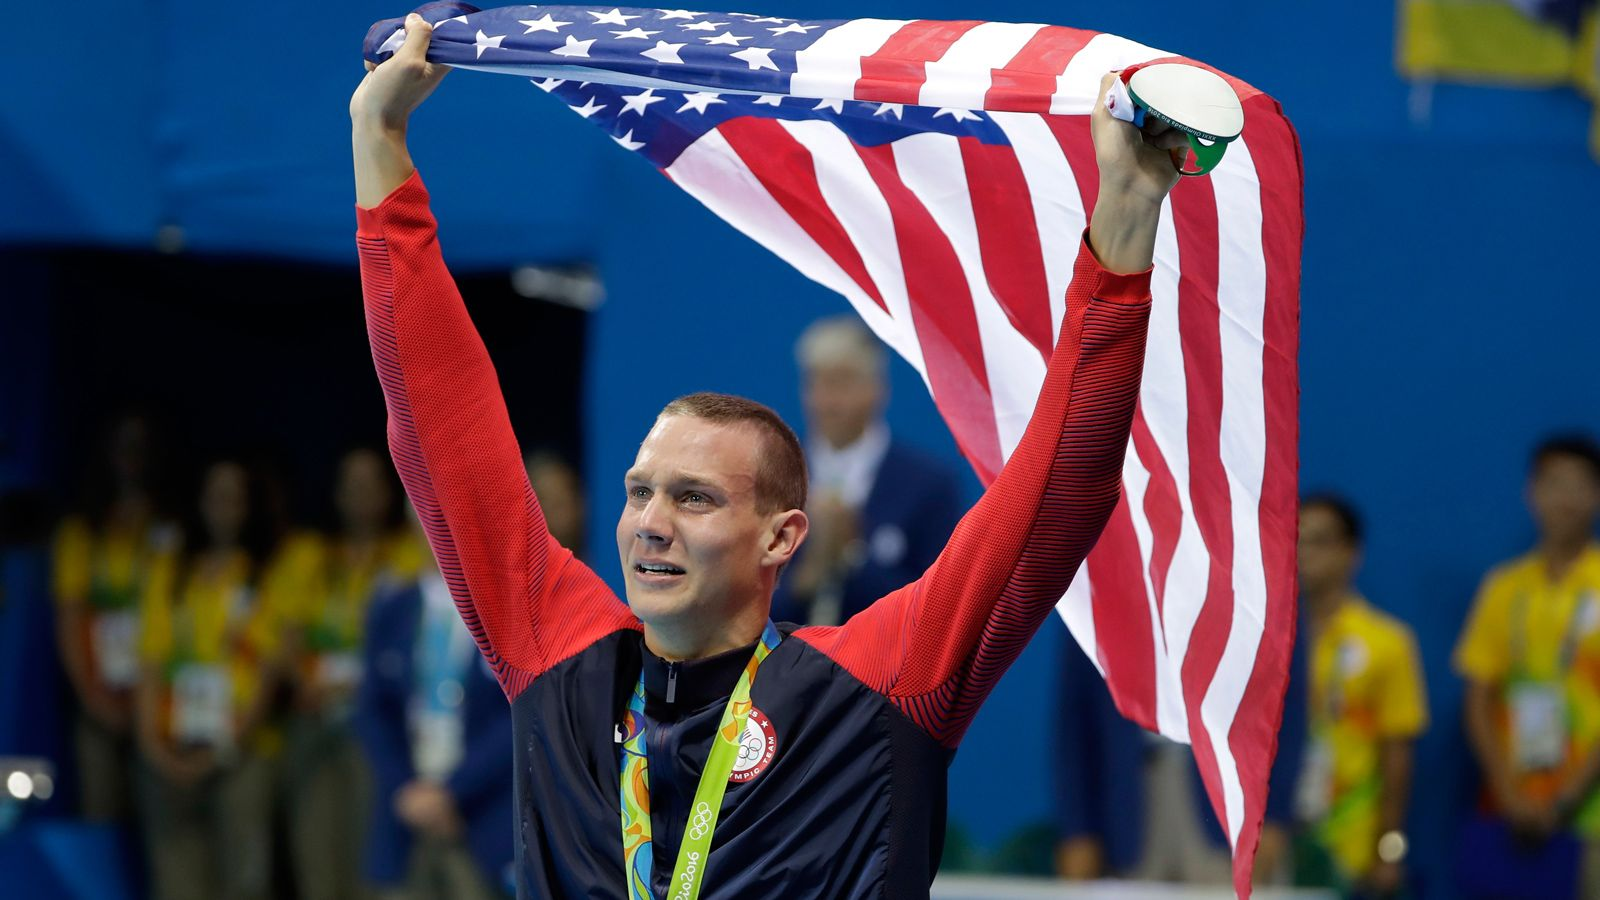 Florida S Caeleb Dressel Captures Gold Medal